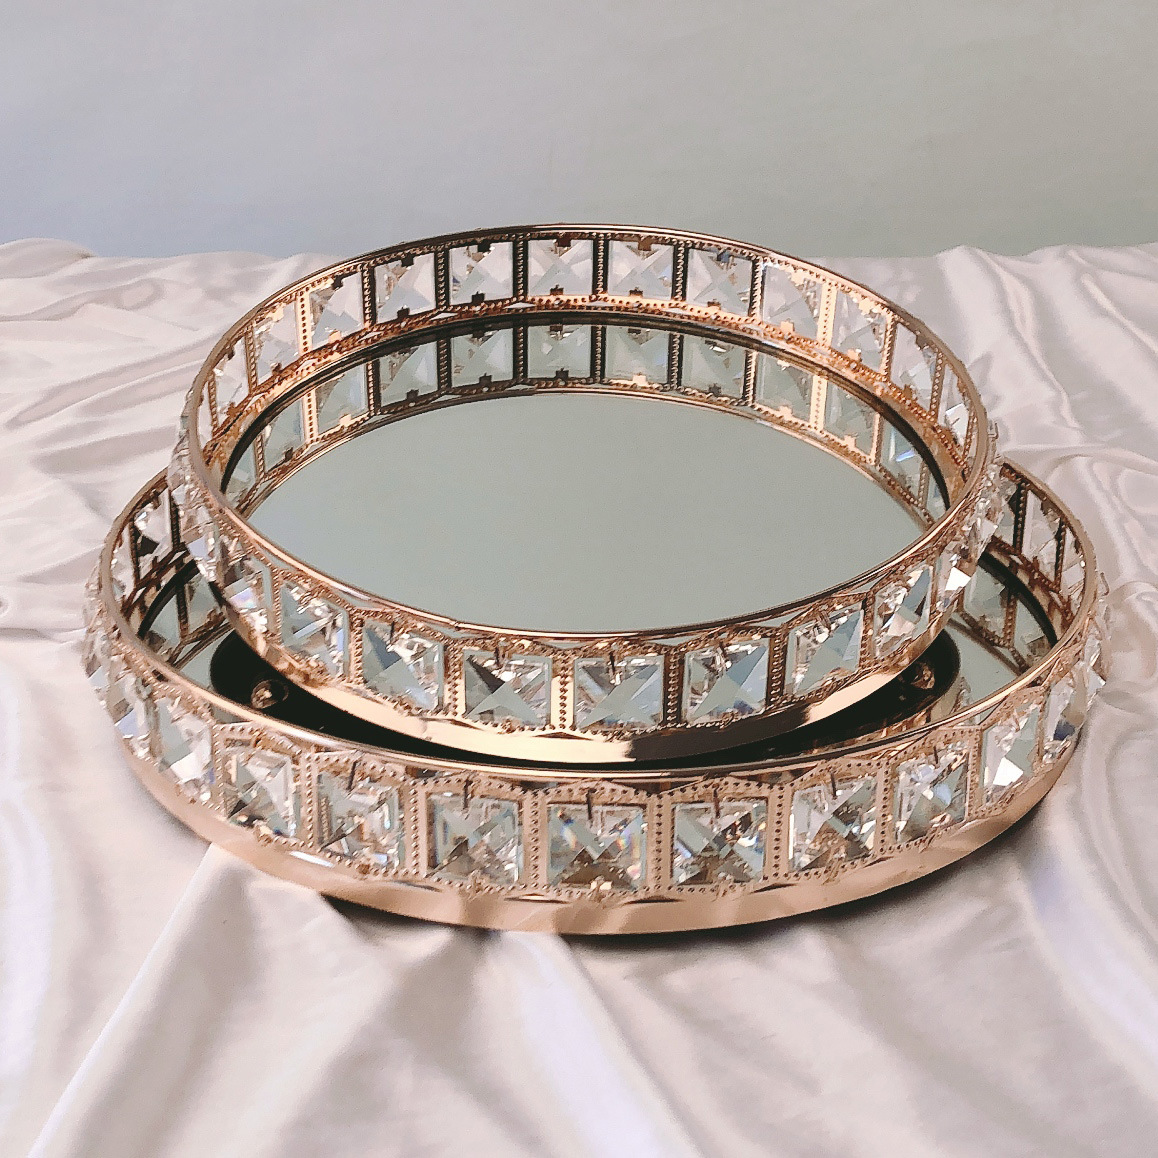 mesa de cozimento suprimentos redonda bandeja de bolo prata & ouro